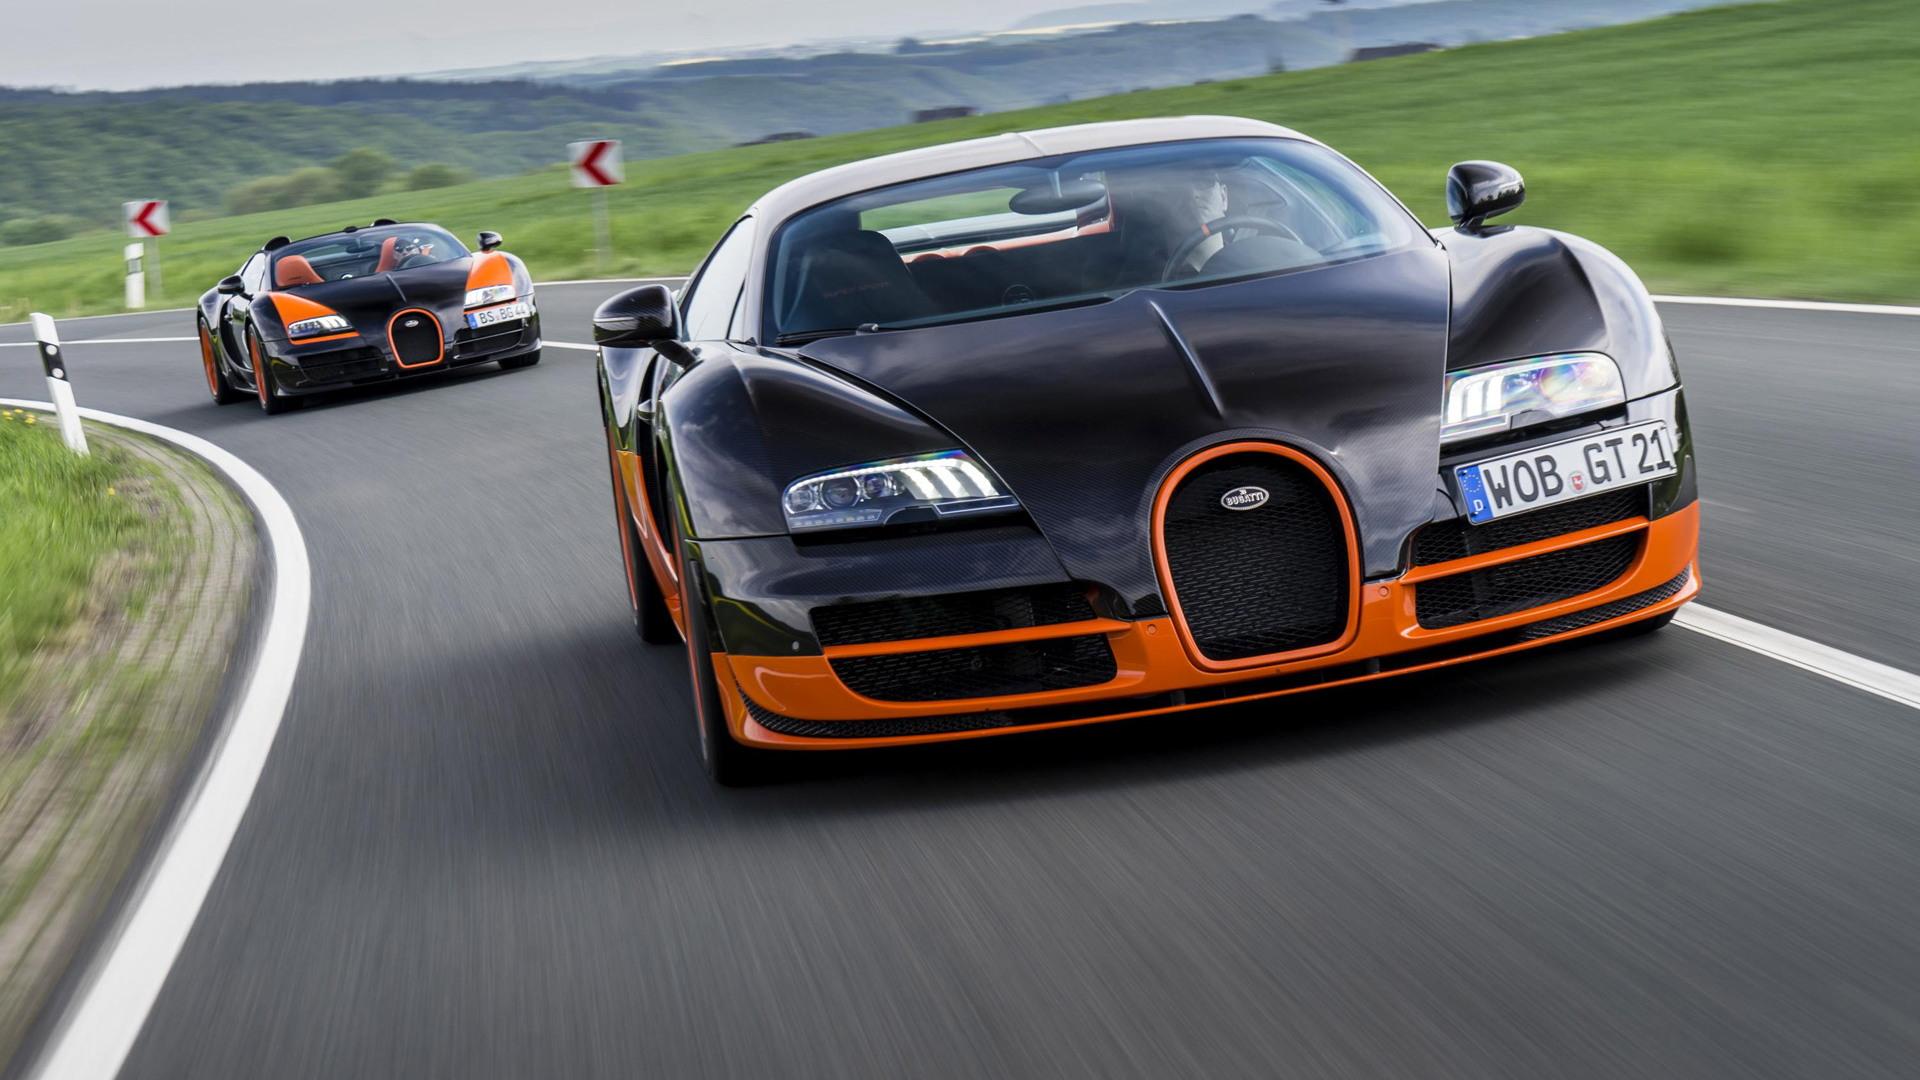 Bugatti Veyron Super Sport and Veyron Grand Sport Vitesse land speed record holders